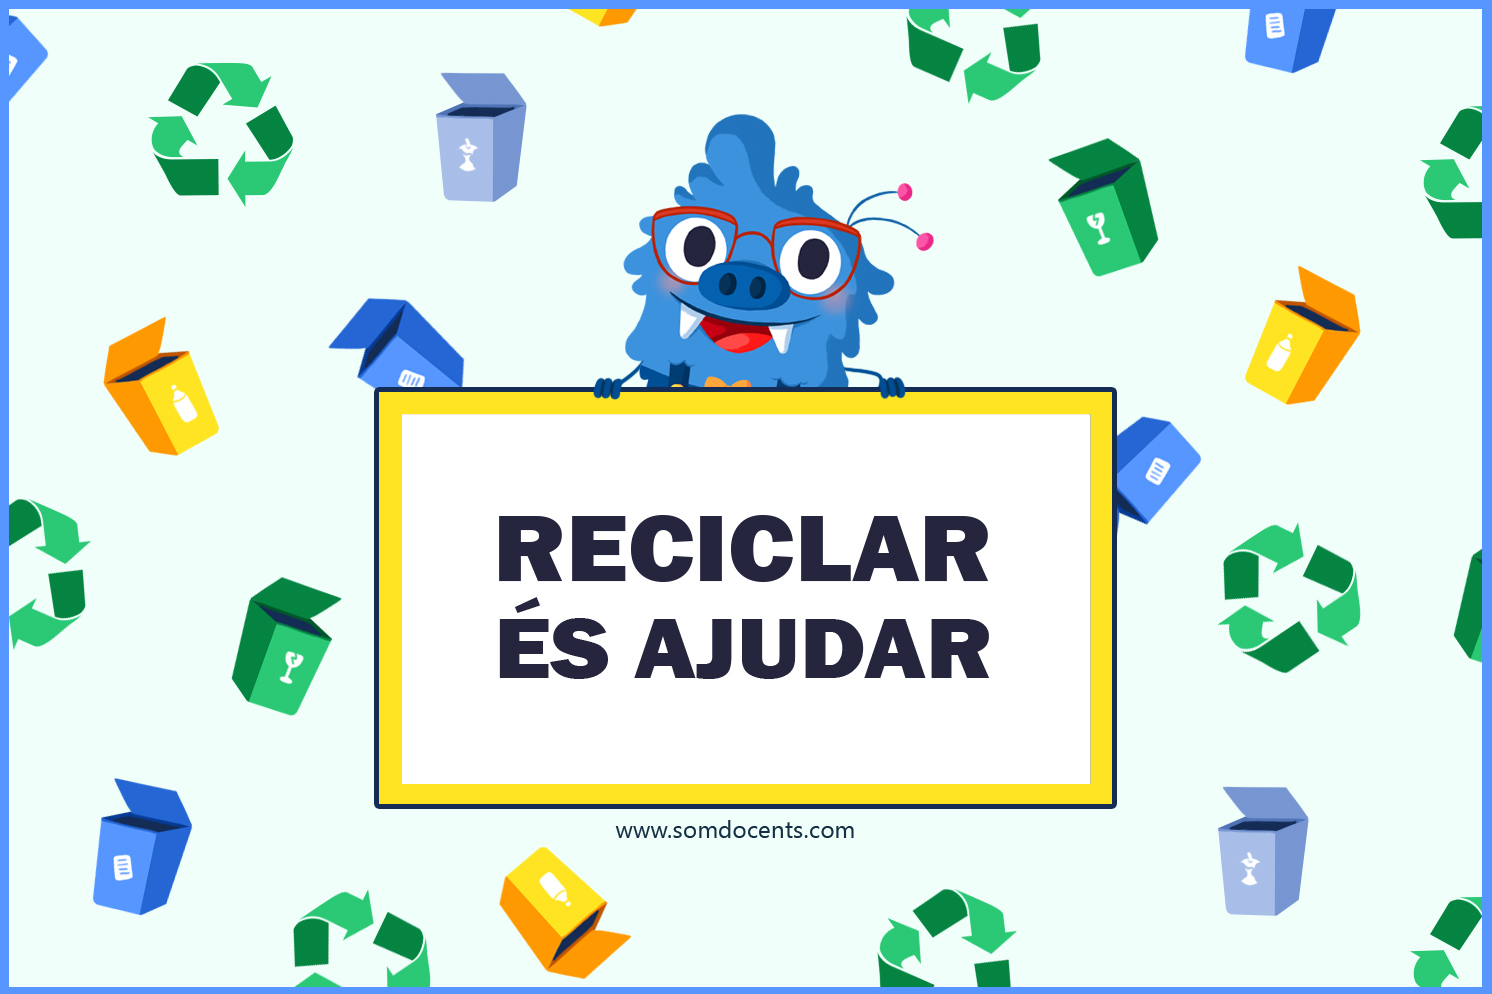 somdocents-reciclar